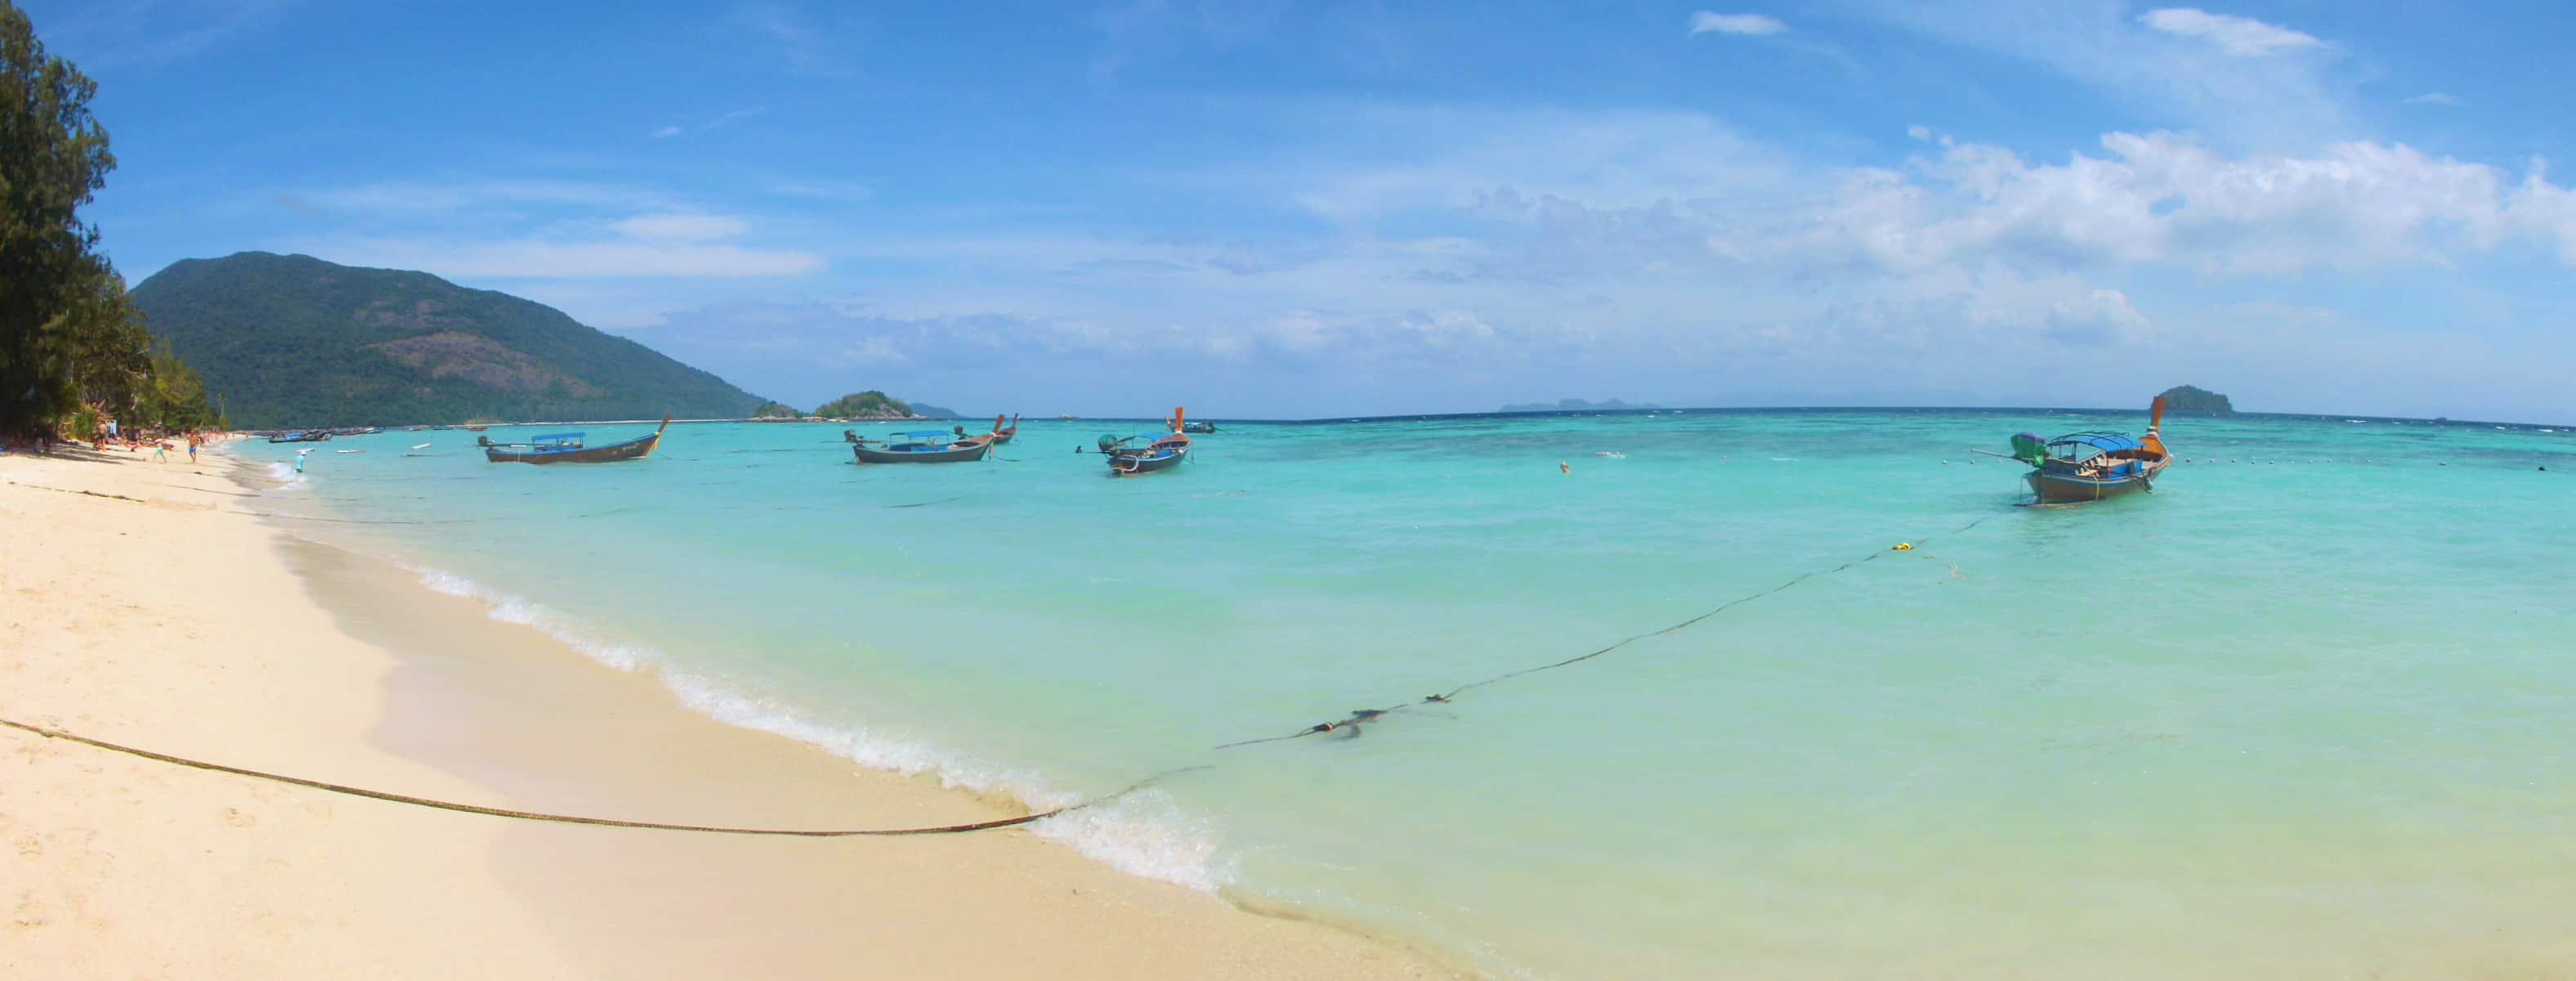 oh-Lipe-Thailand-7-Travel-Mermaid